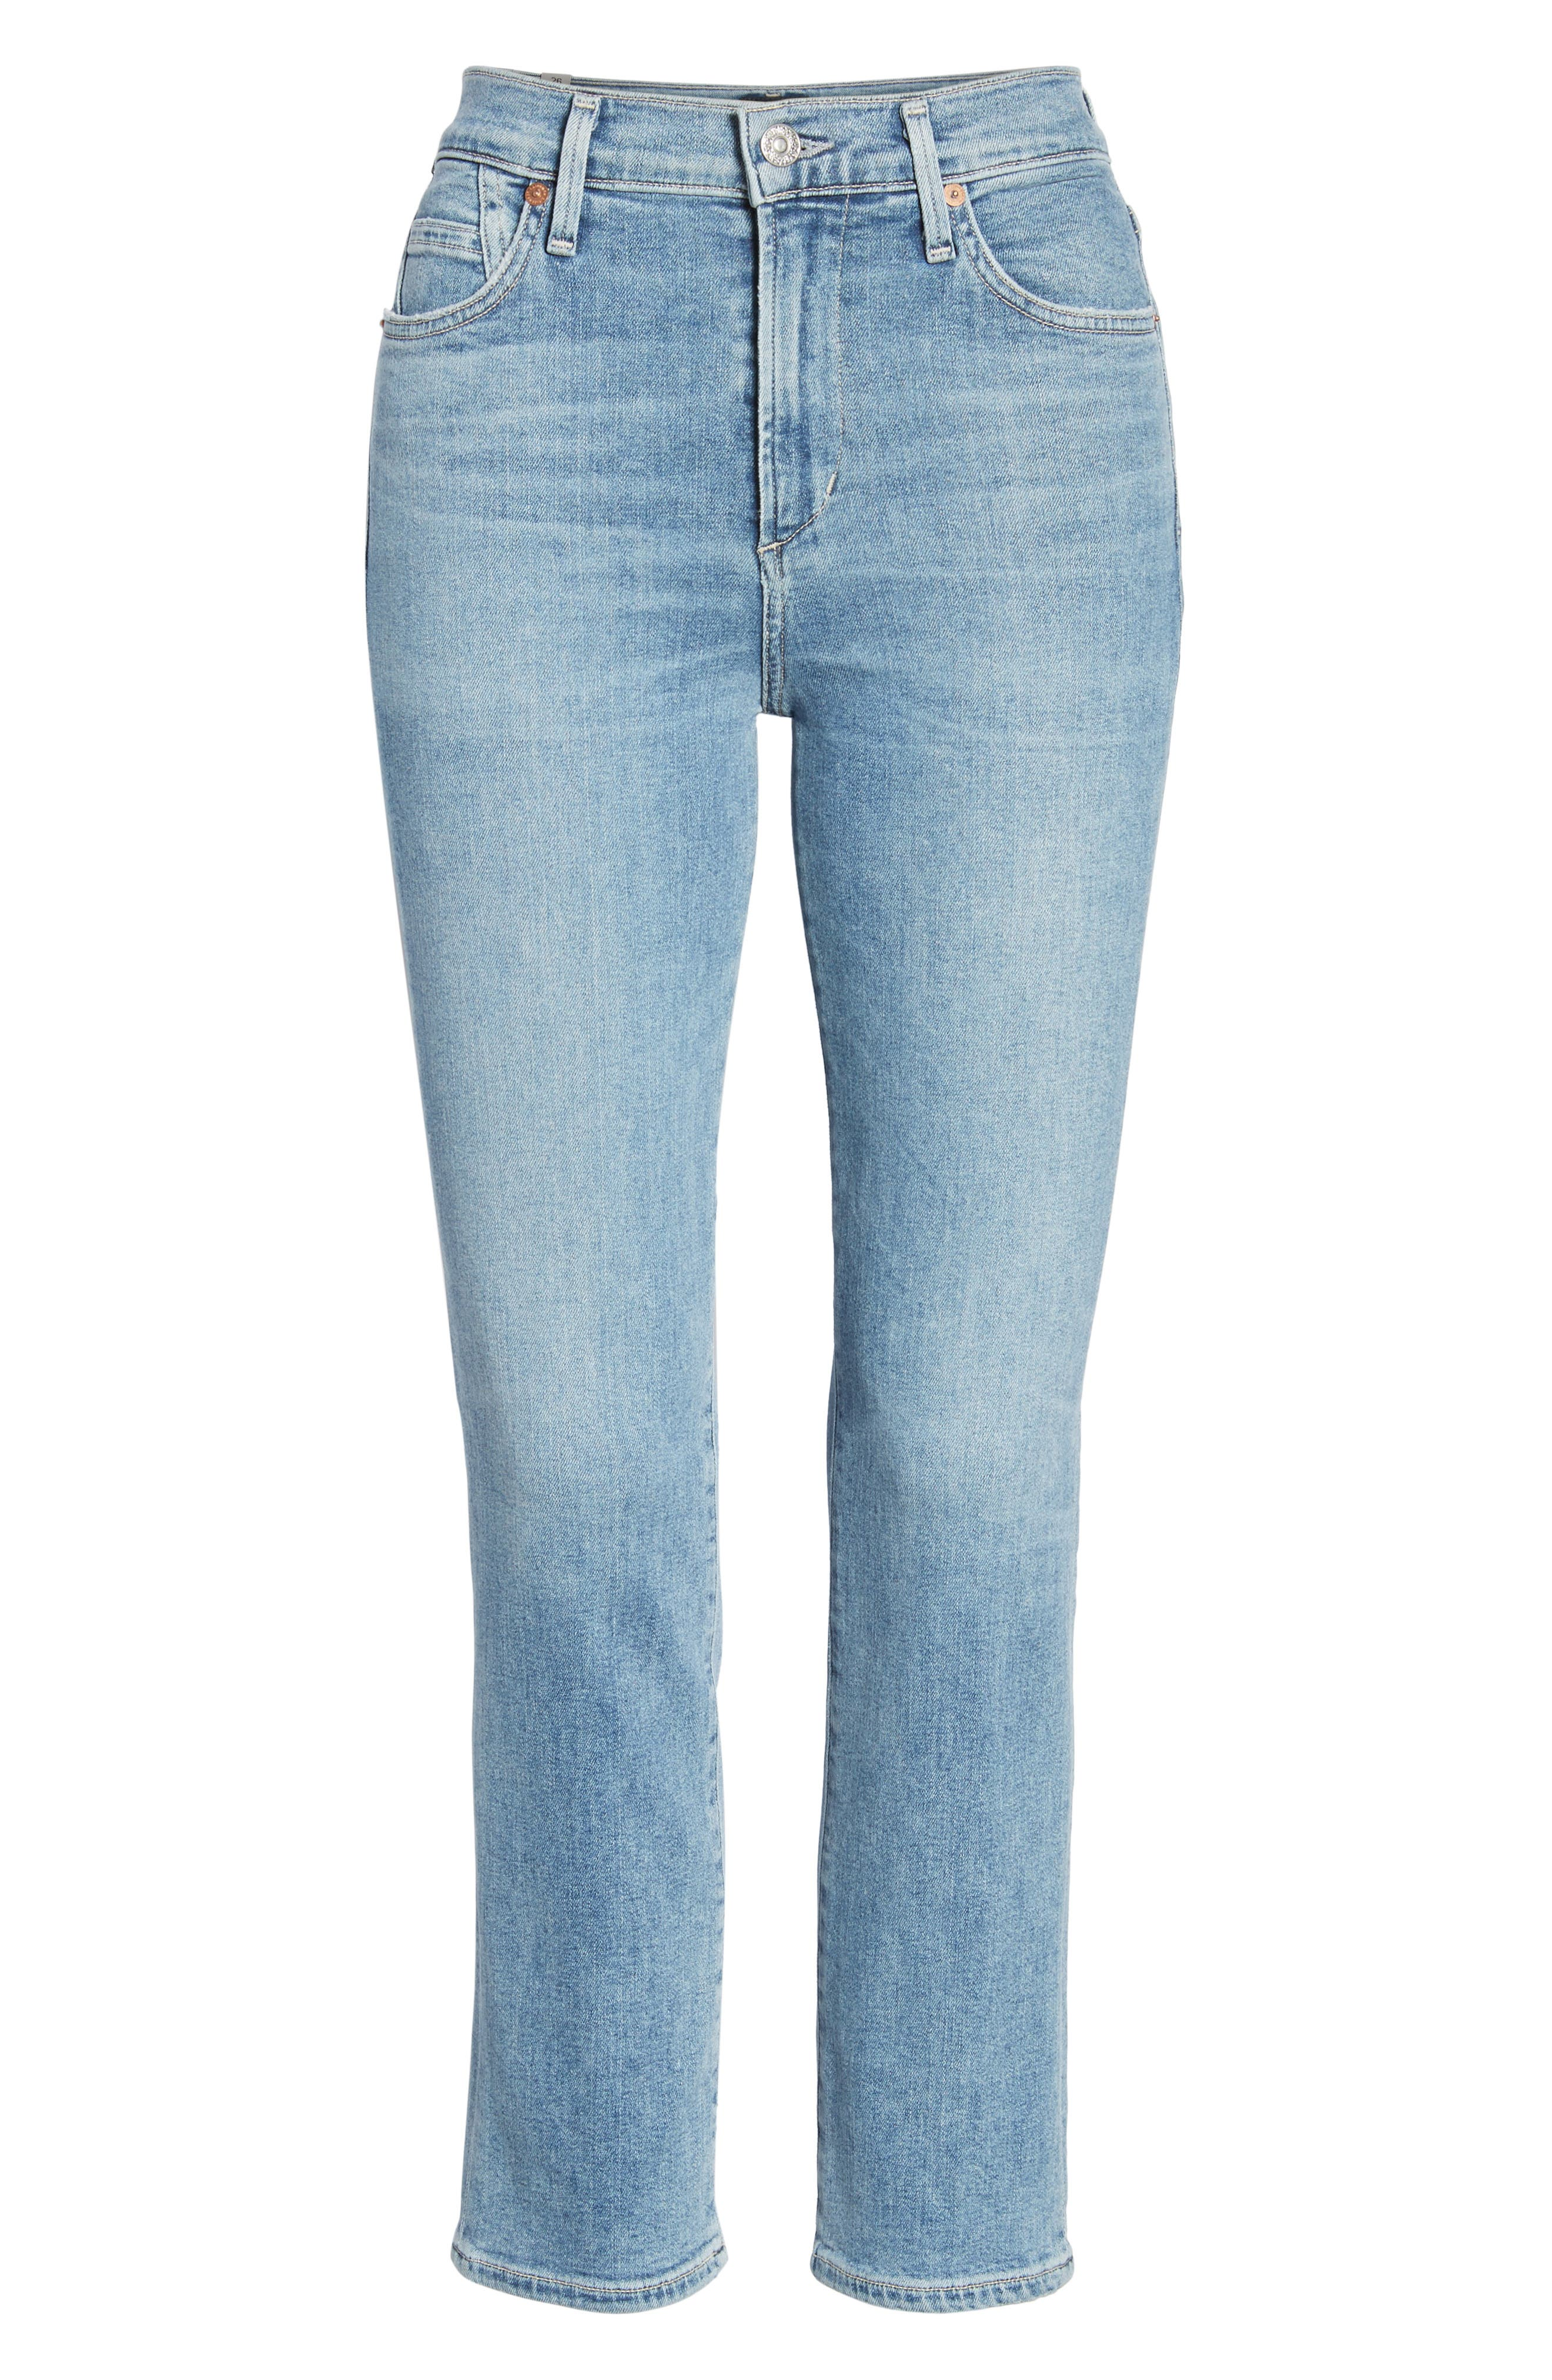 Cara Ankle Cigarette Jeans,                             Alternate thumbnail 7, color,                             457